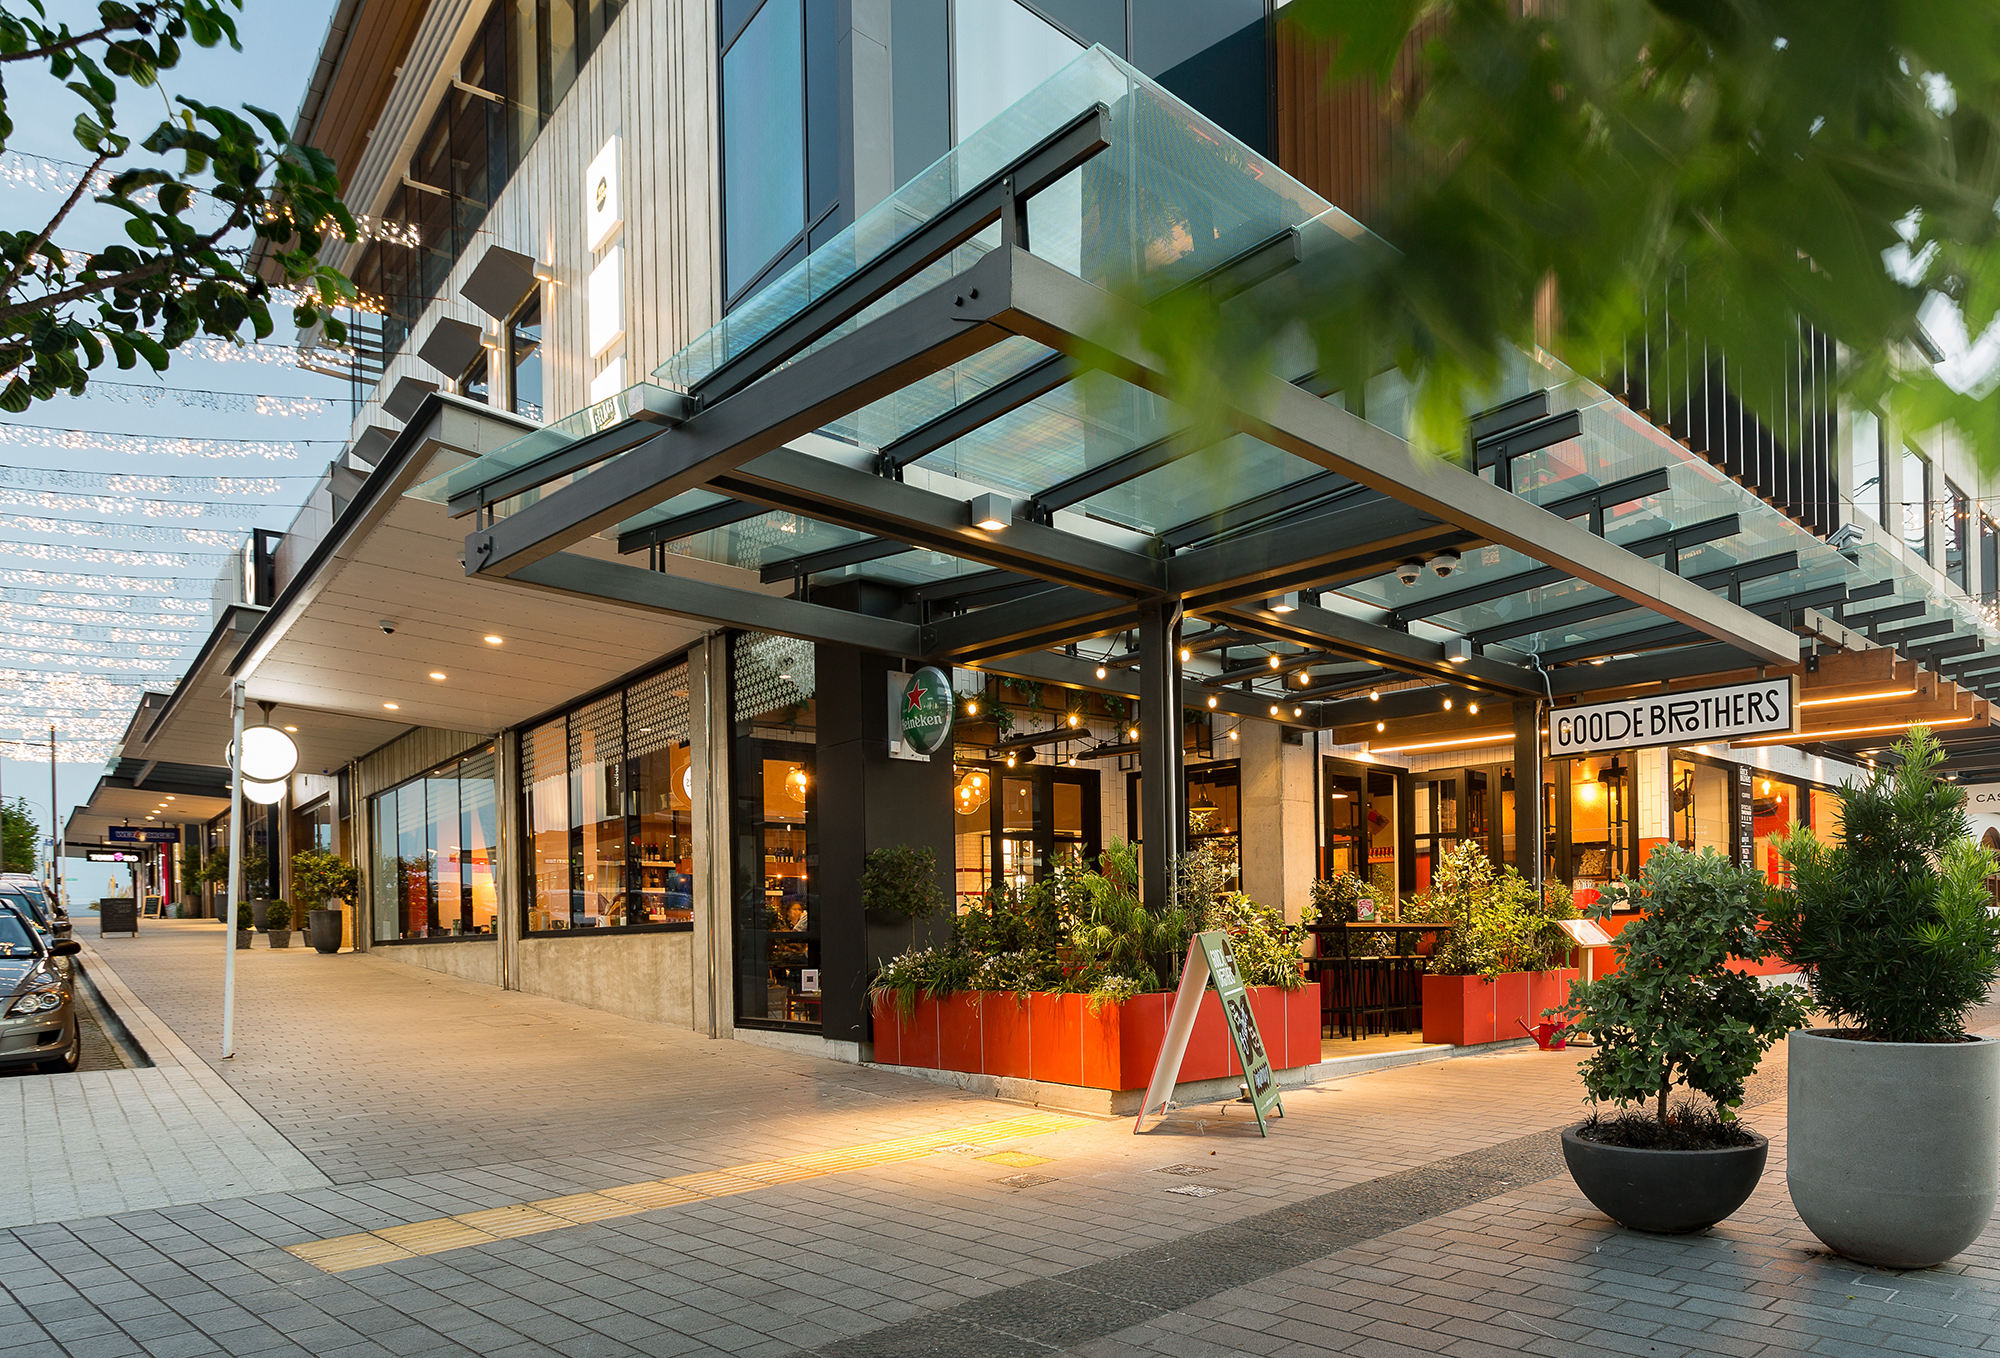 Westgate 便利生活,拥抱未来 West Hills多类型住宅项目,开启美好生活